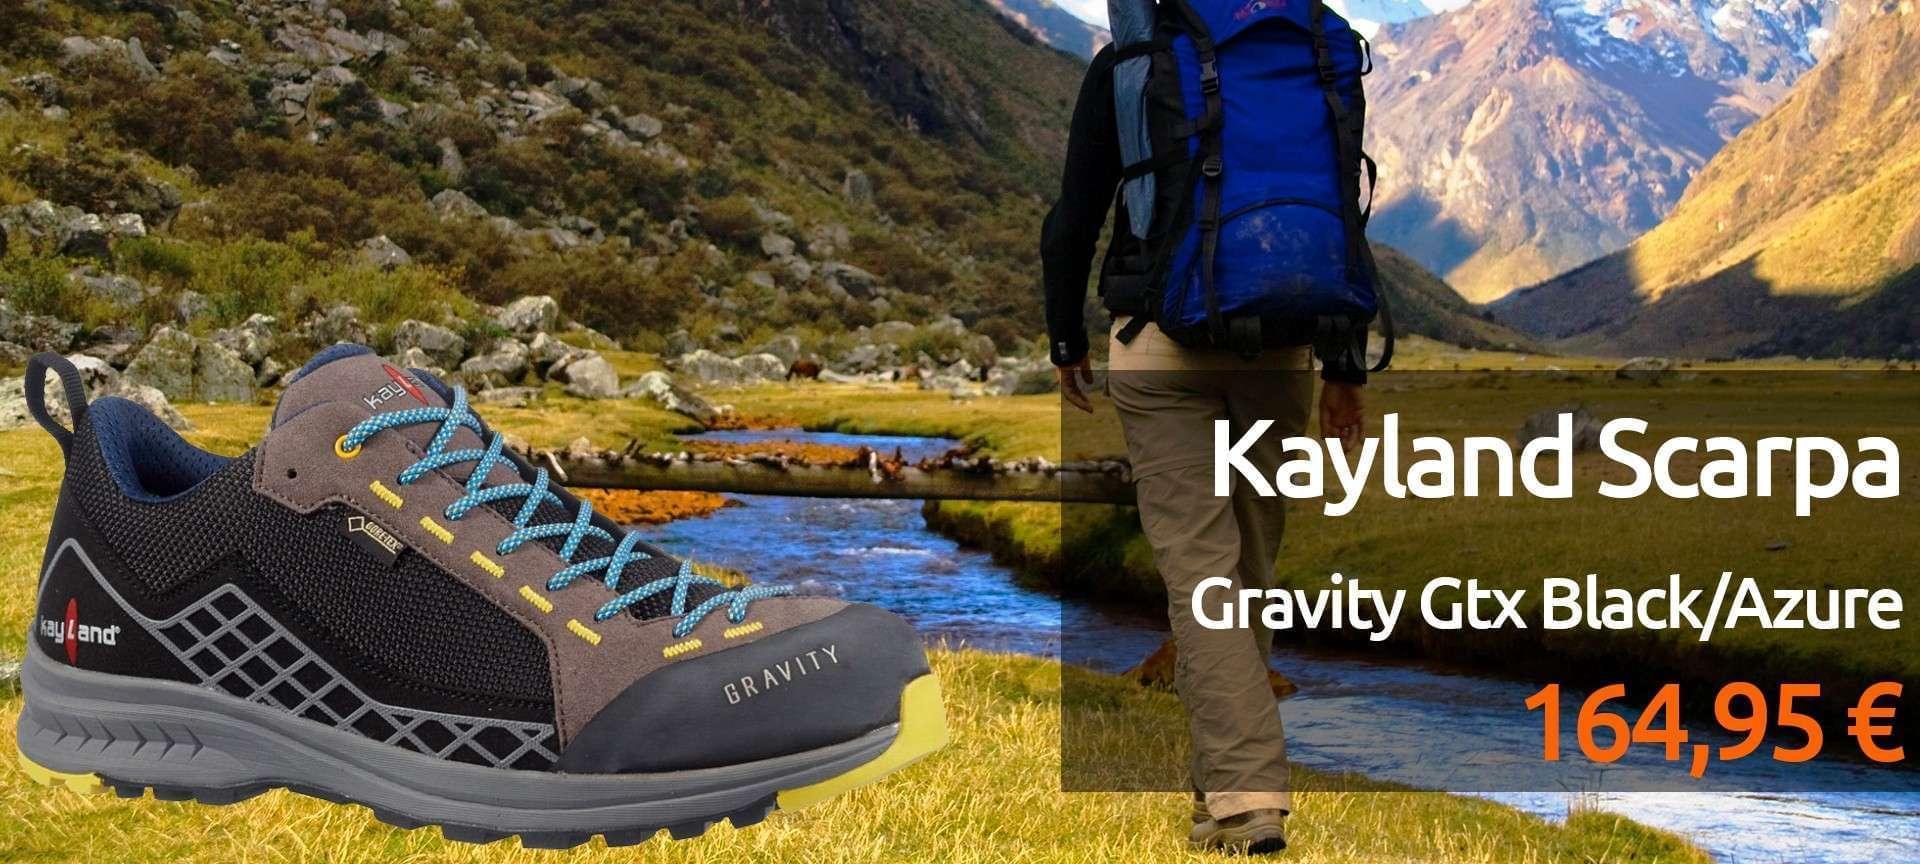 Scarpe Kayland Scarpa Gravity Gtx Black/Azure